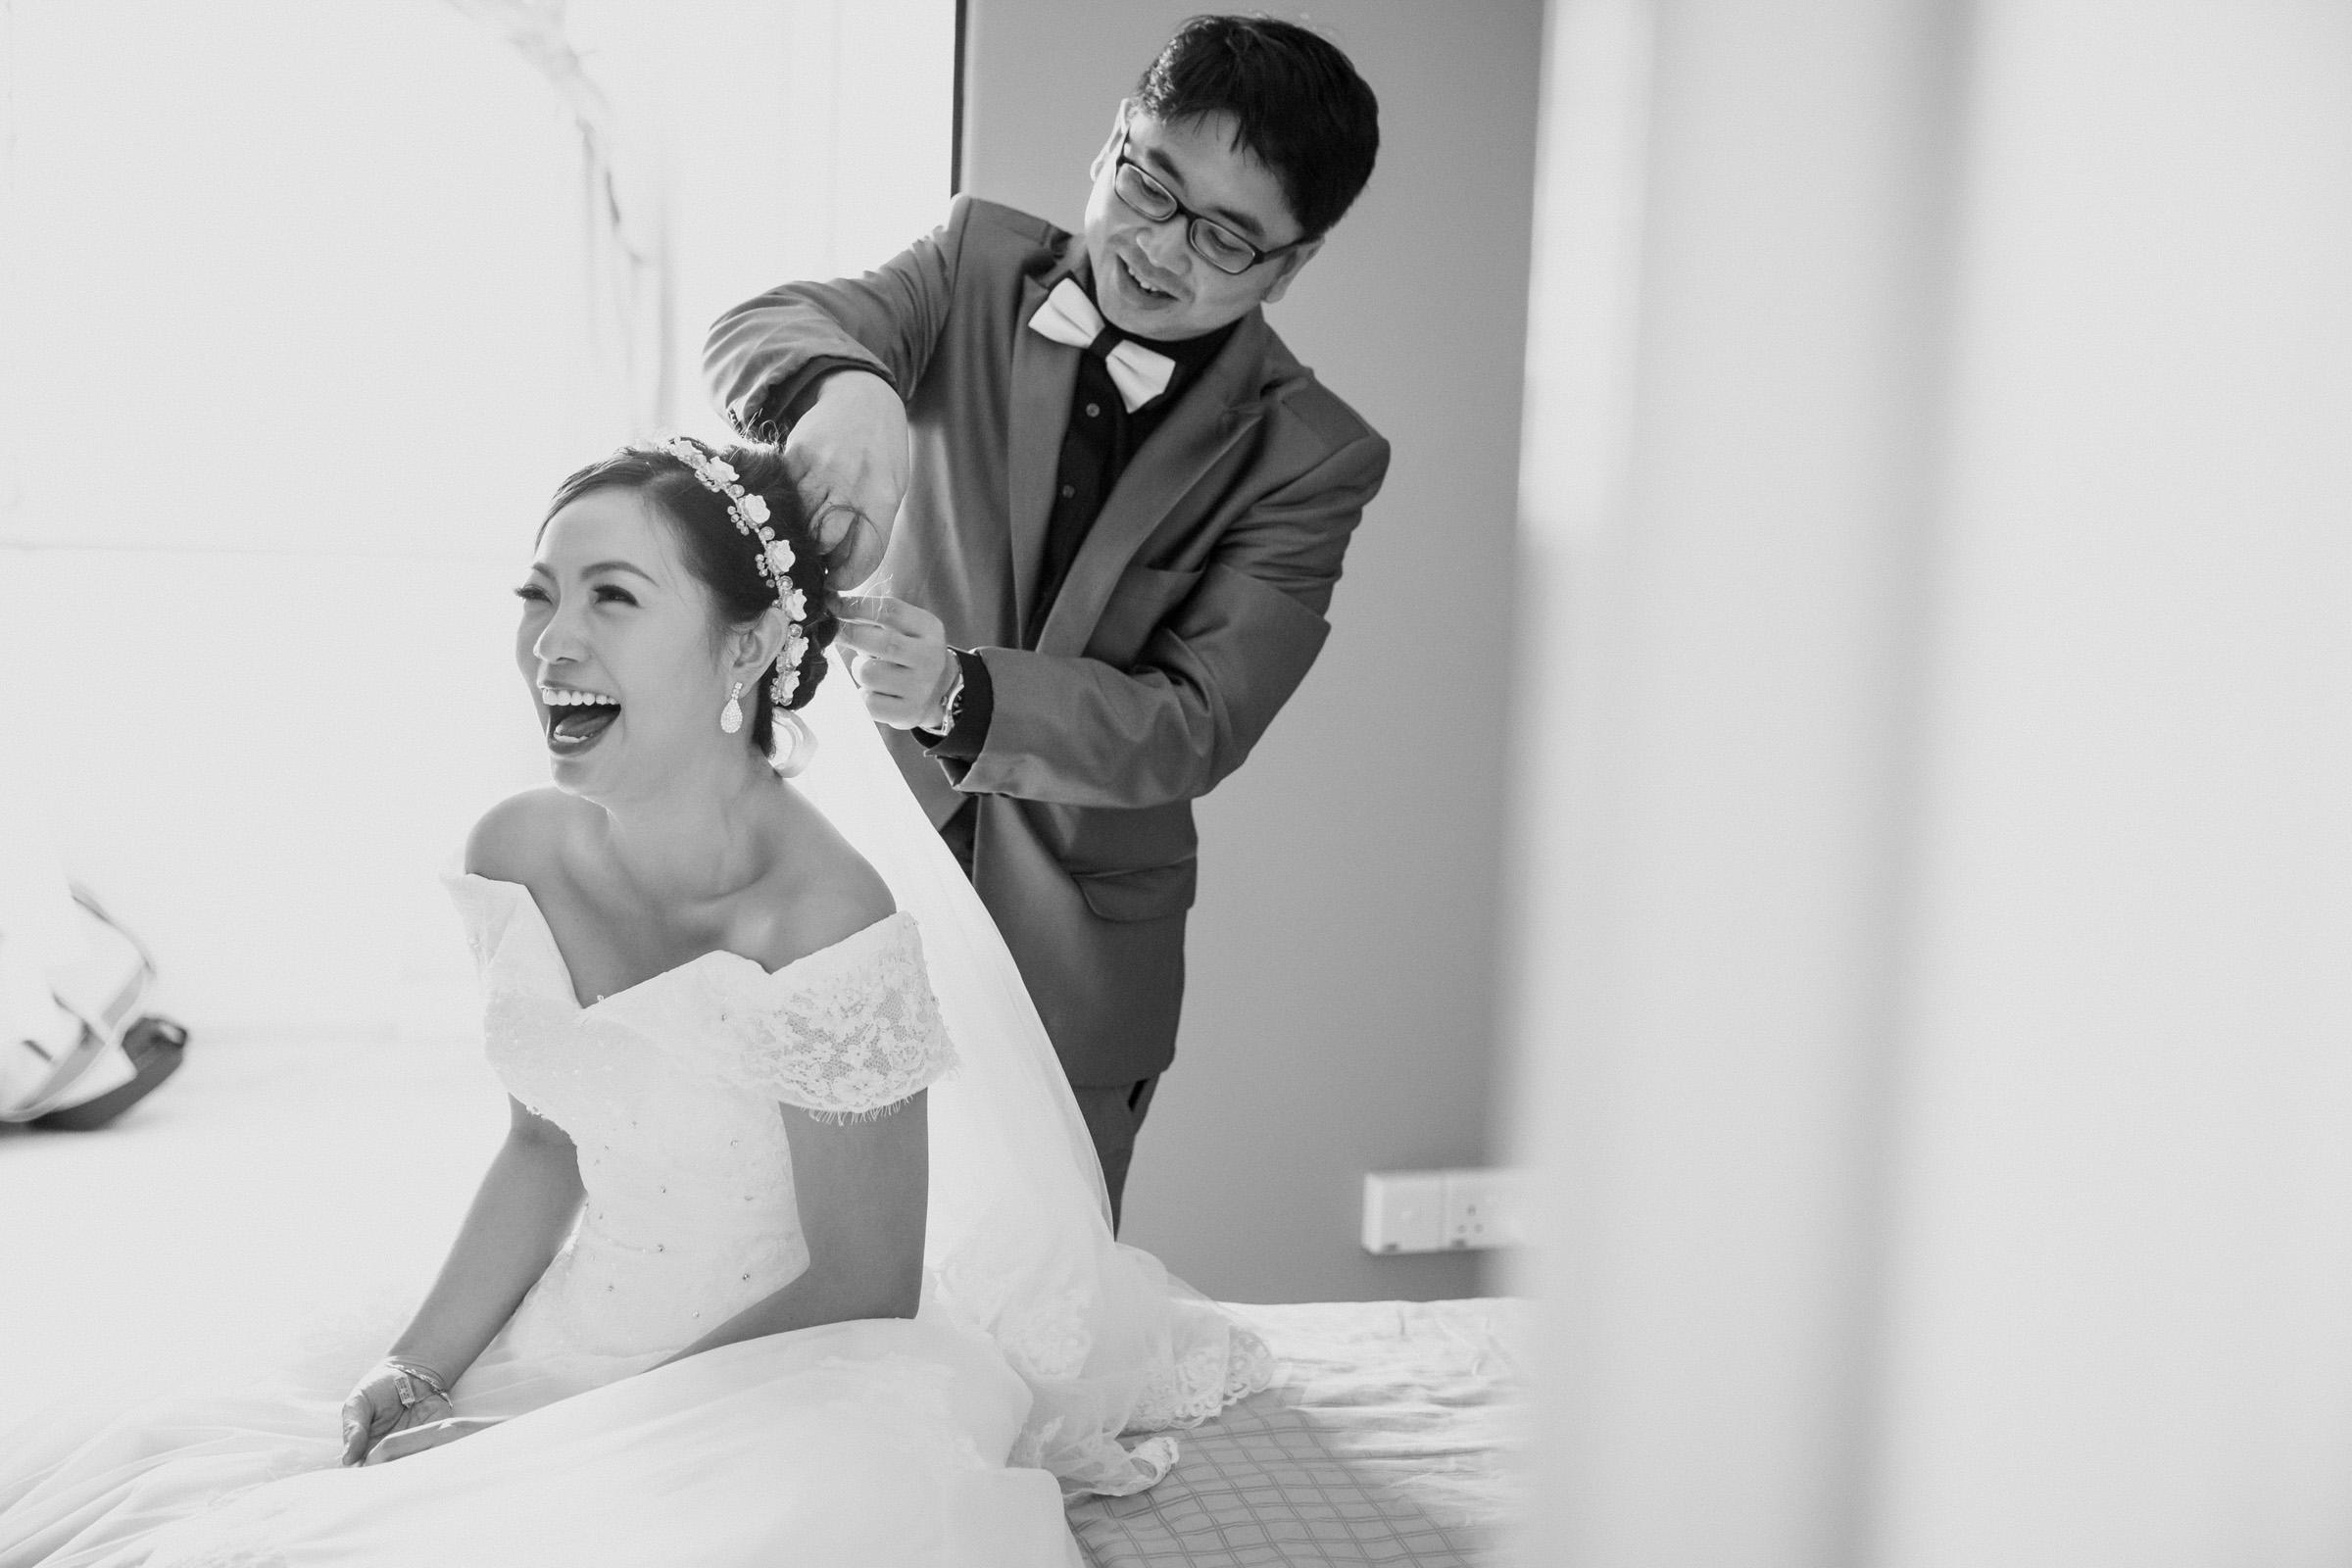 Steven_Jasmine_Wedding_Walldrobe Photography_Wedding shoots_Actual day wedding_Photographer (25)